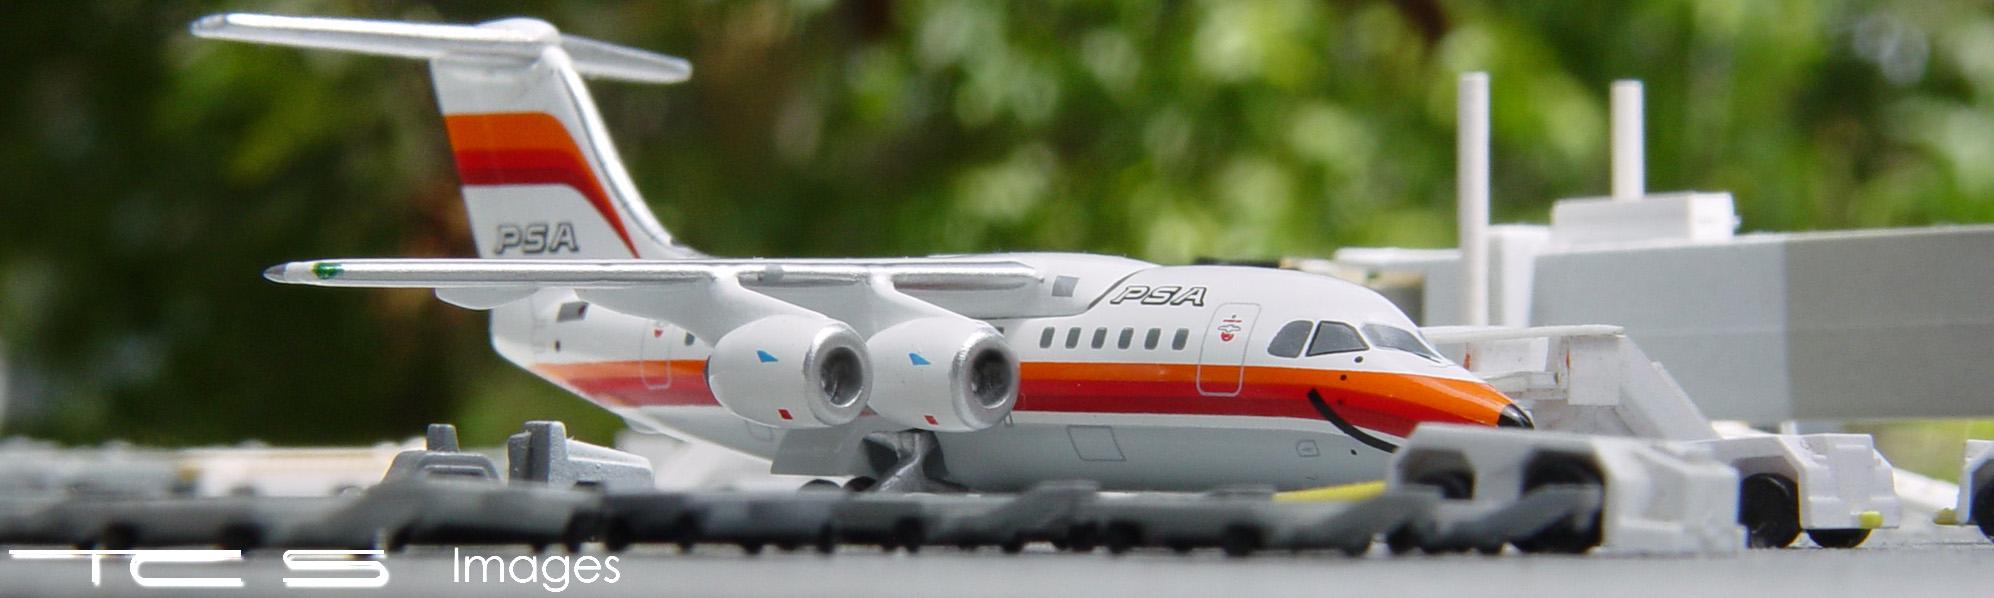 PSA BAe 146